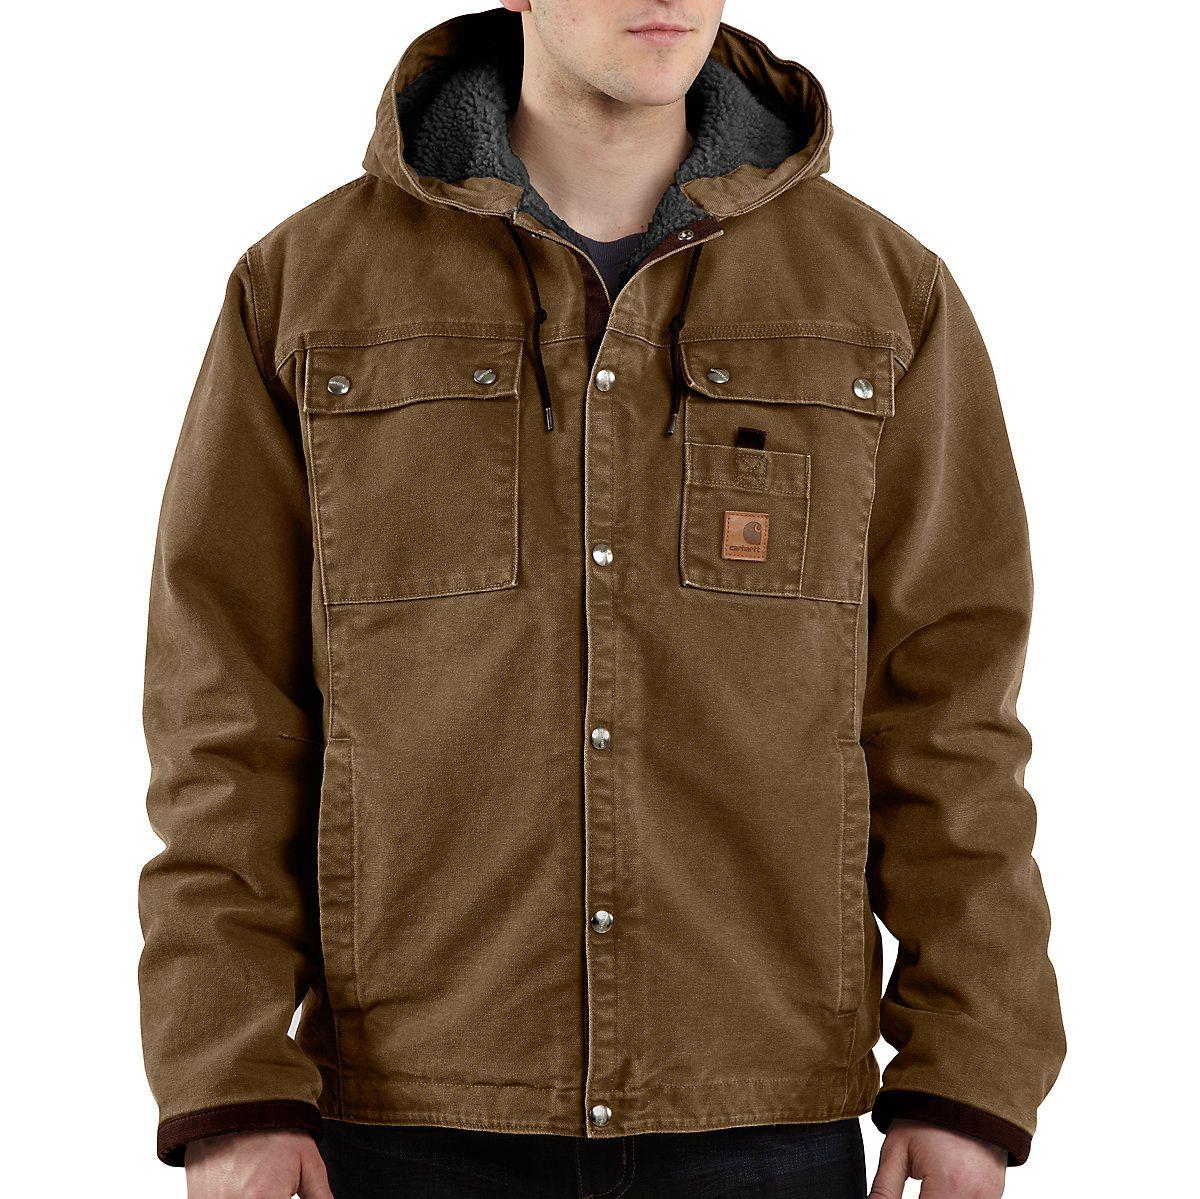 Sandstone Hooded Multi Pocket Jacket Sherpa Lined Carhartt Jacket Outdoor Outfit Jackets For Big Men [ 1199 x 1200 Pixel ]